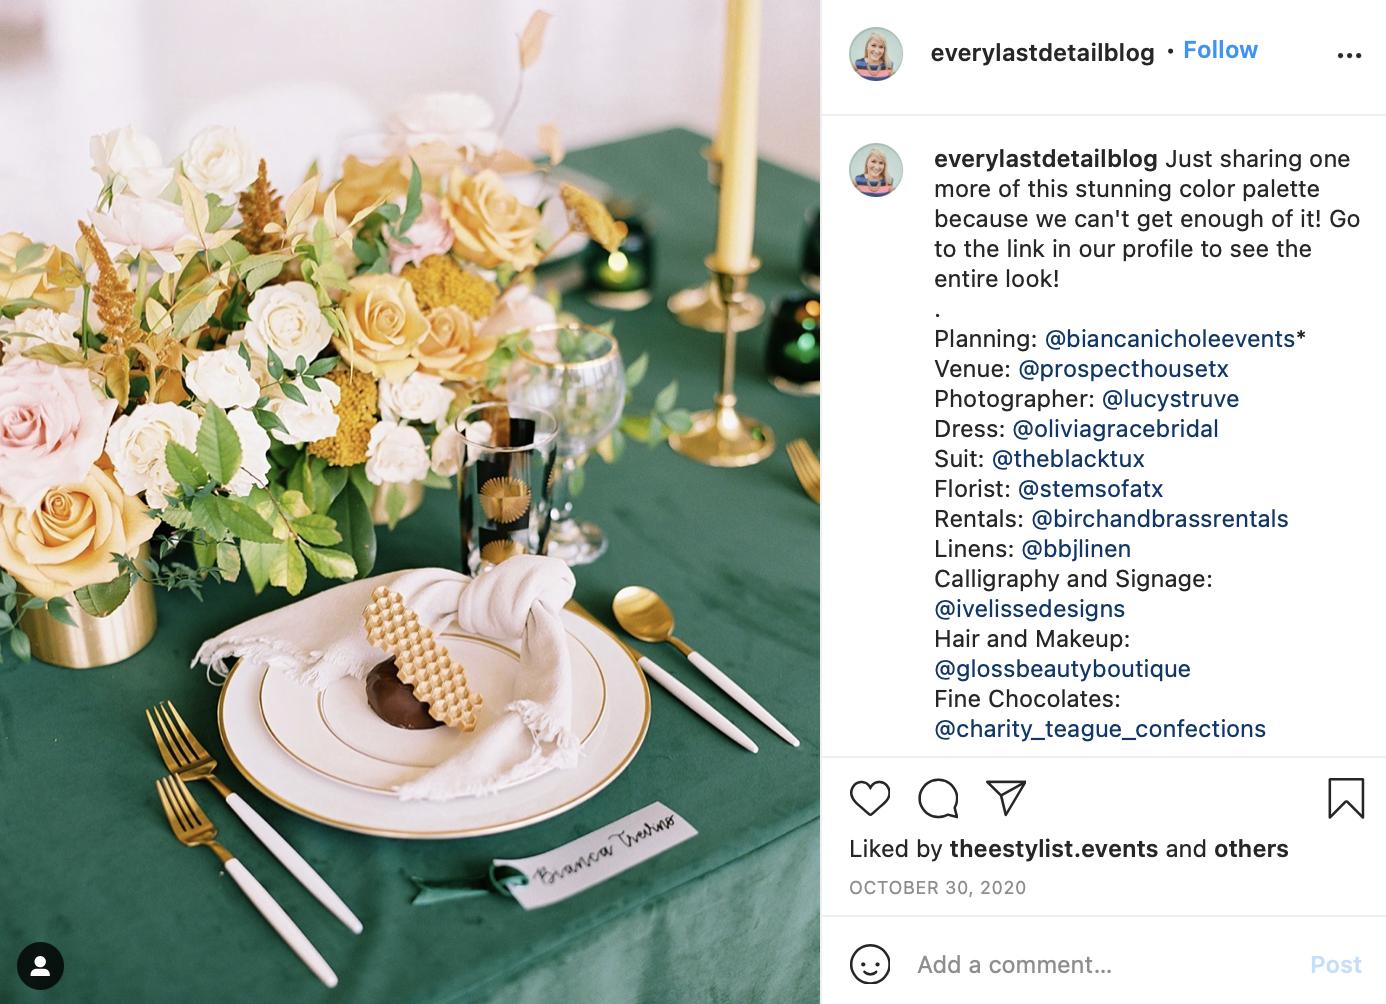 yellow, green, and brown wedding table setting